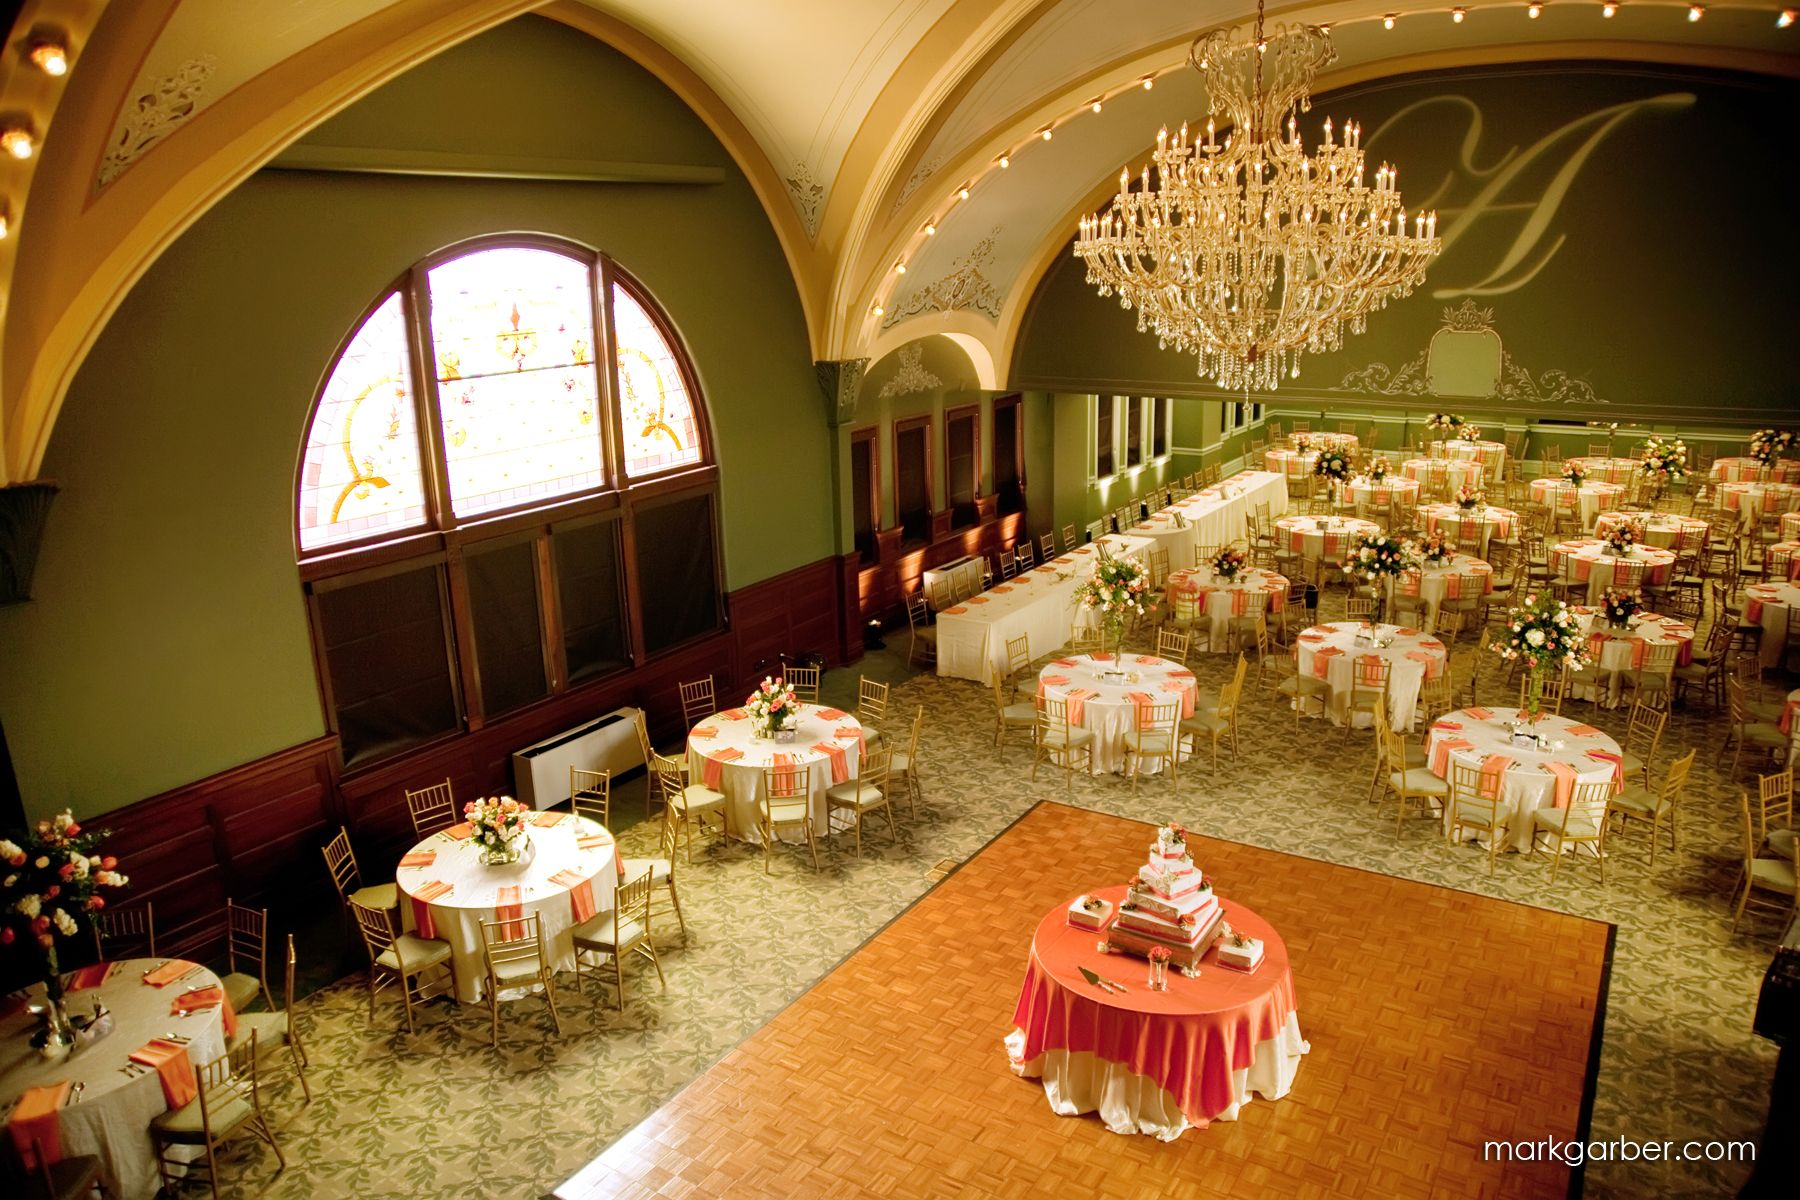 For Piqua Ballroom Piqua Ohio Www Primetimepartyrental Com Dayton Weddings Party Events Rental Markgarber Wedding Reception Tables Event Rental Piqua